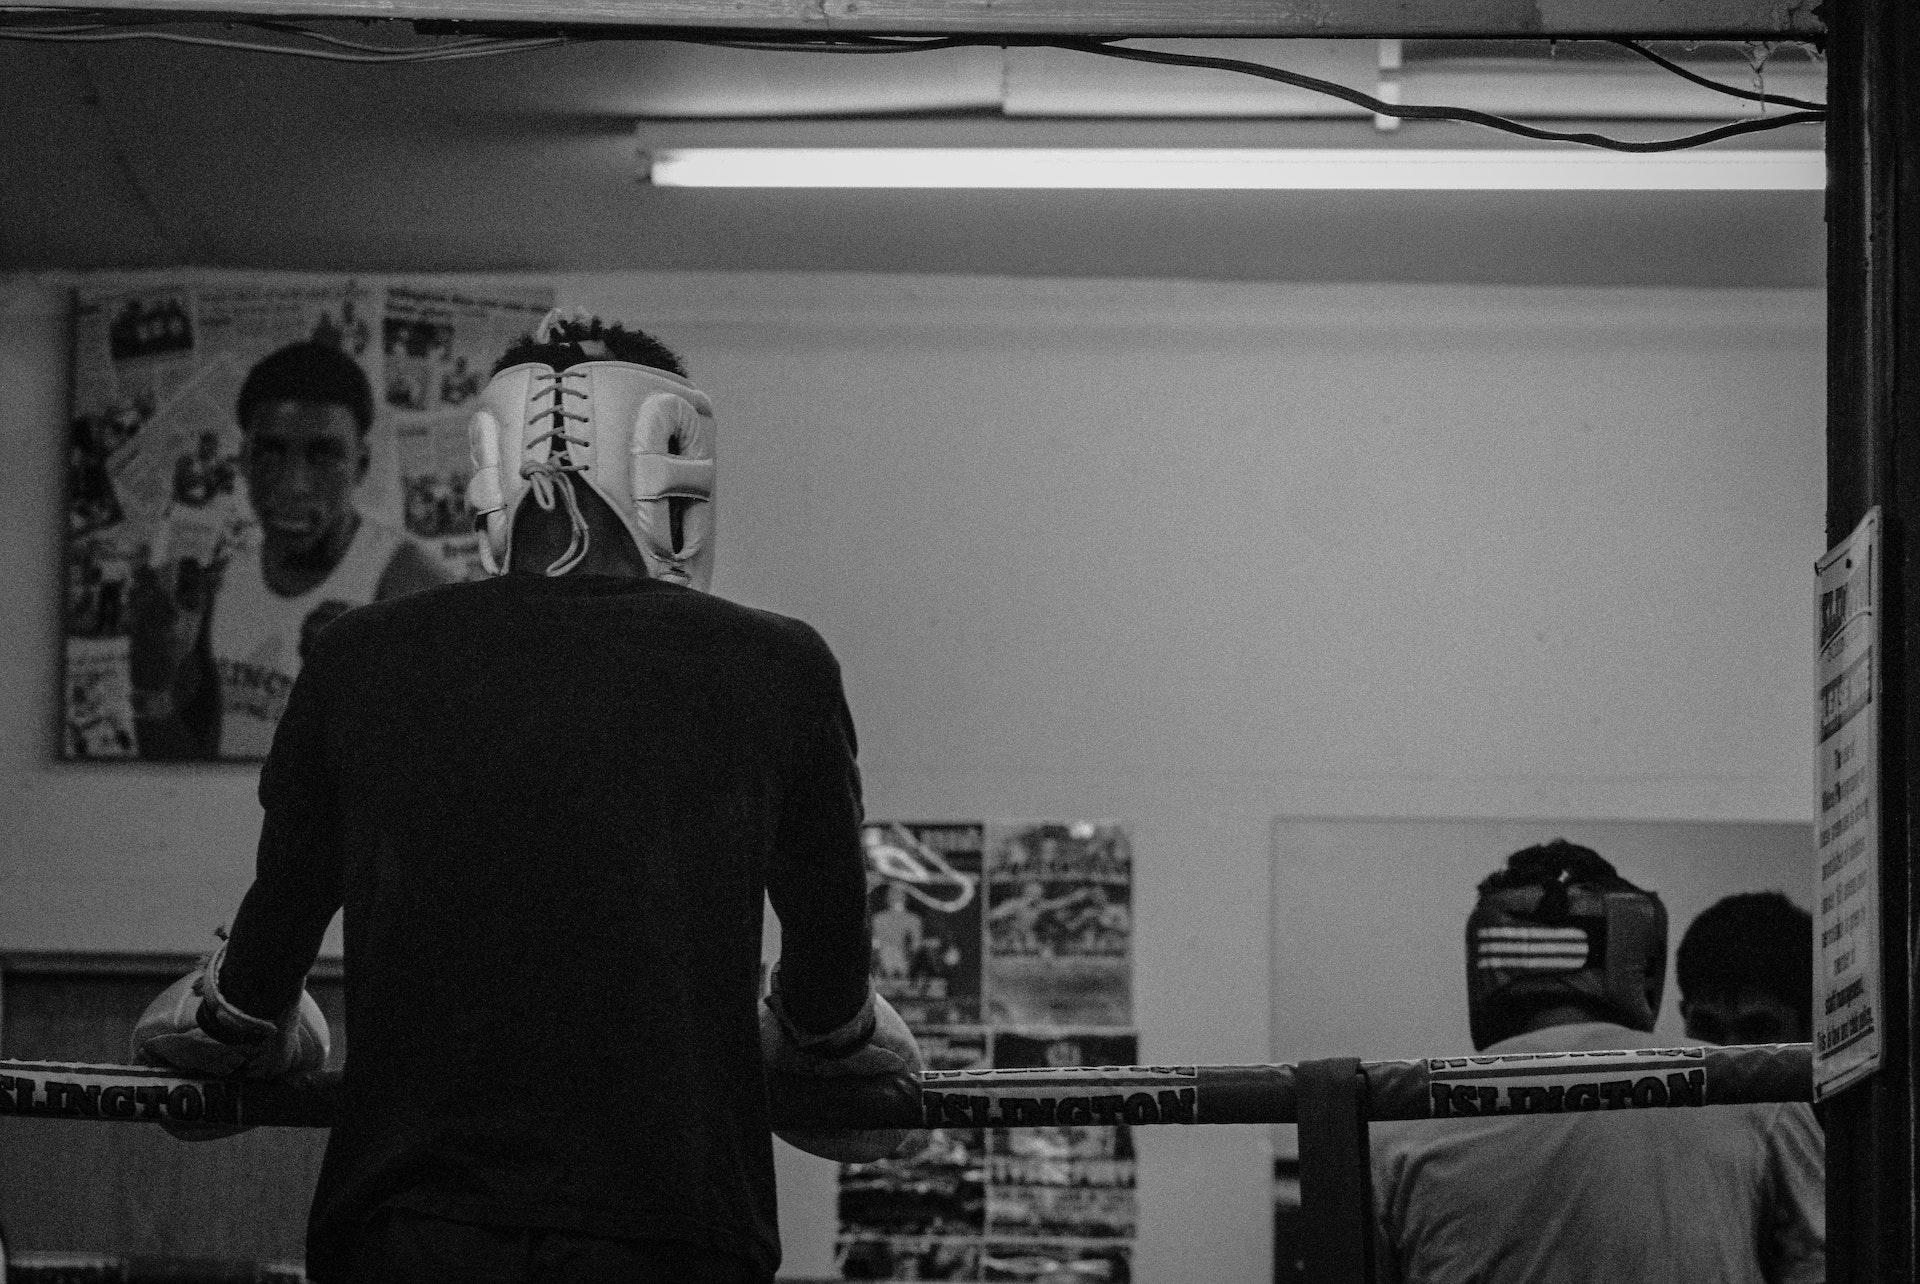 Islington_Boxing_Club-19